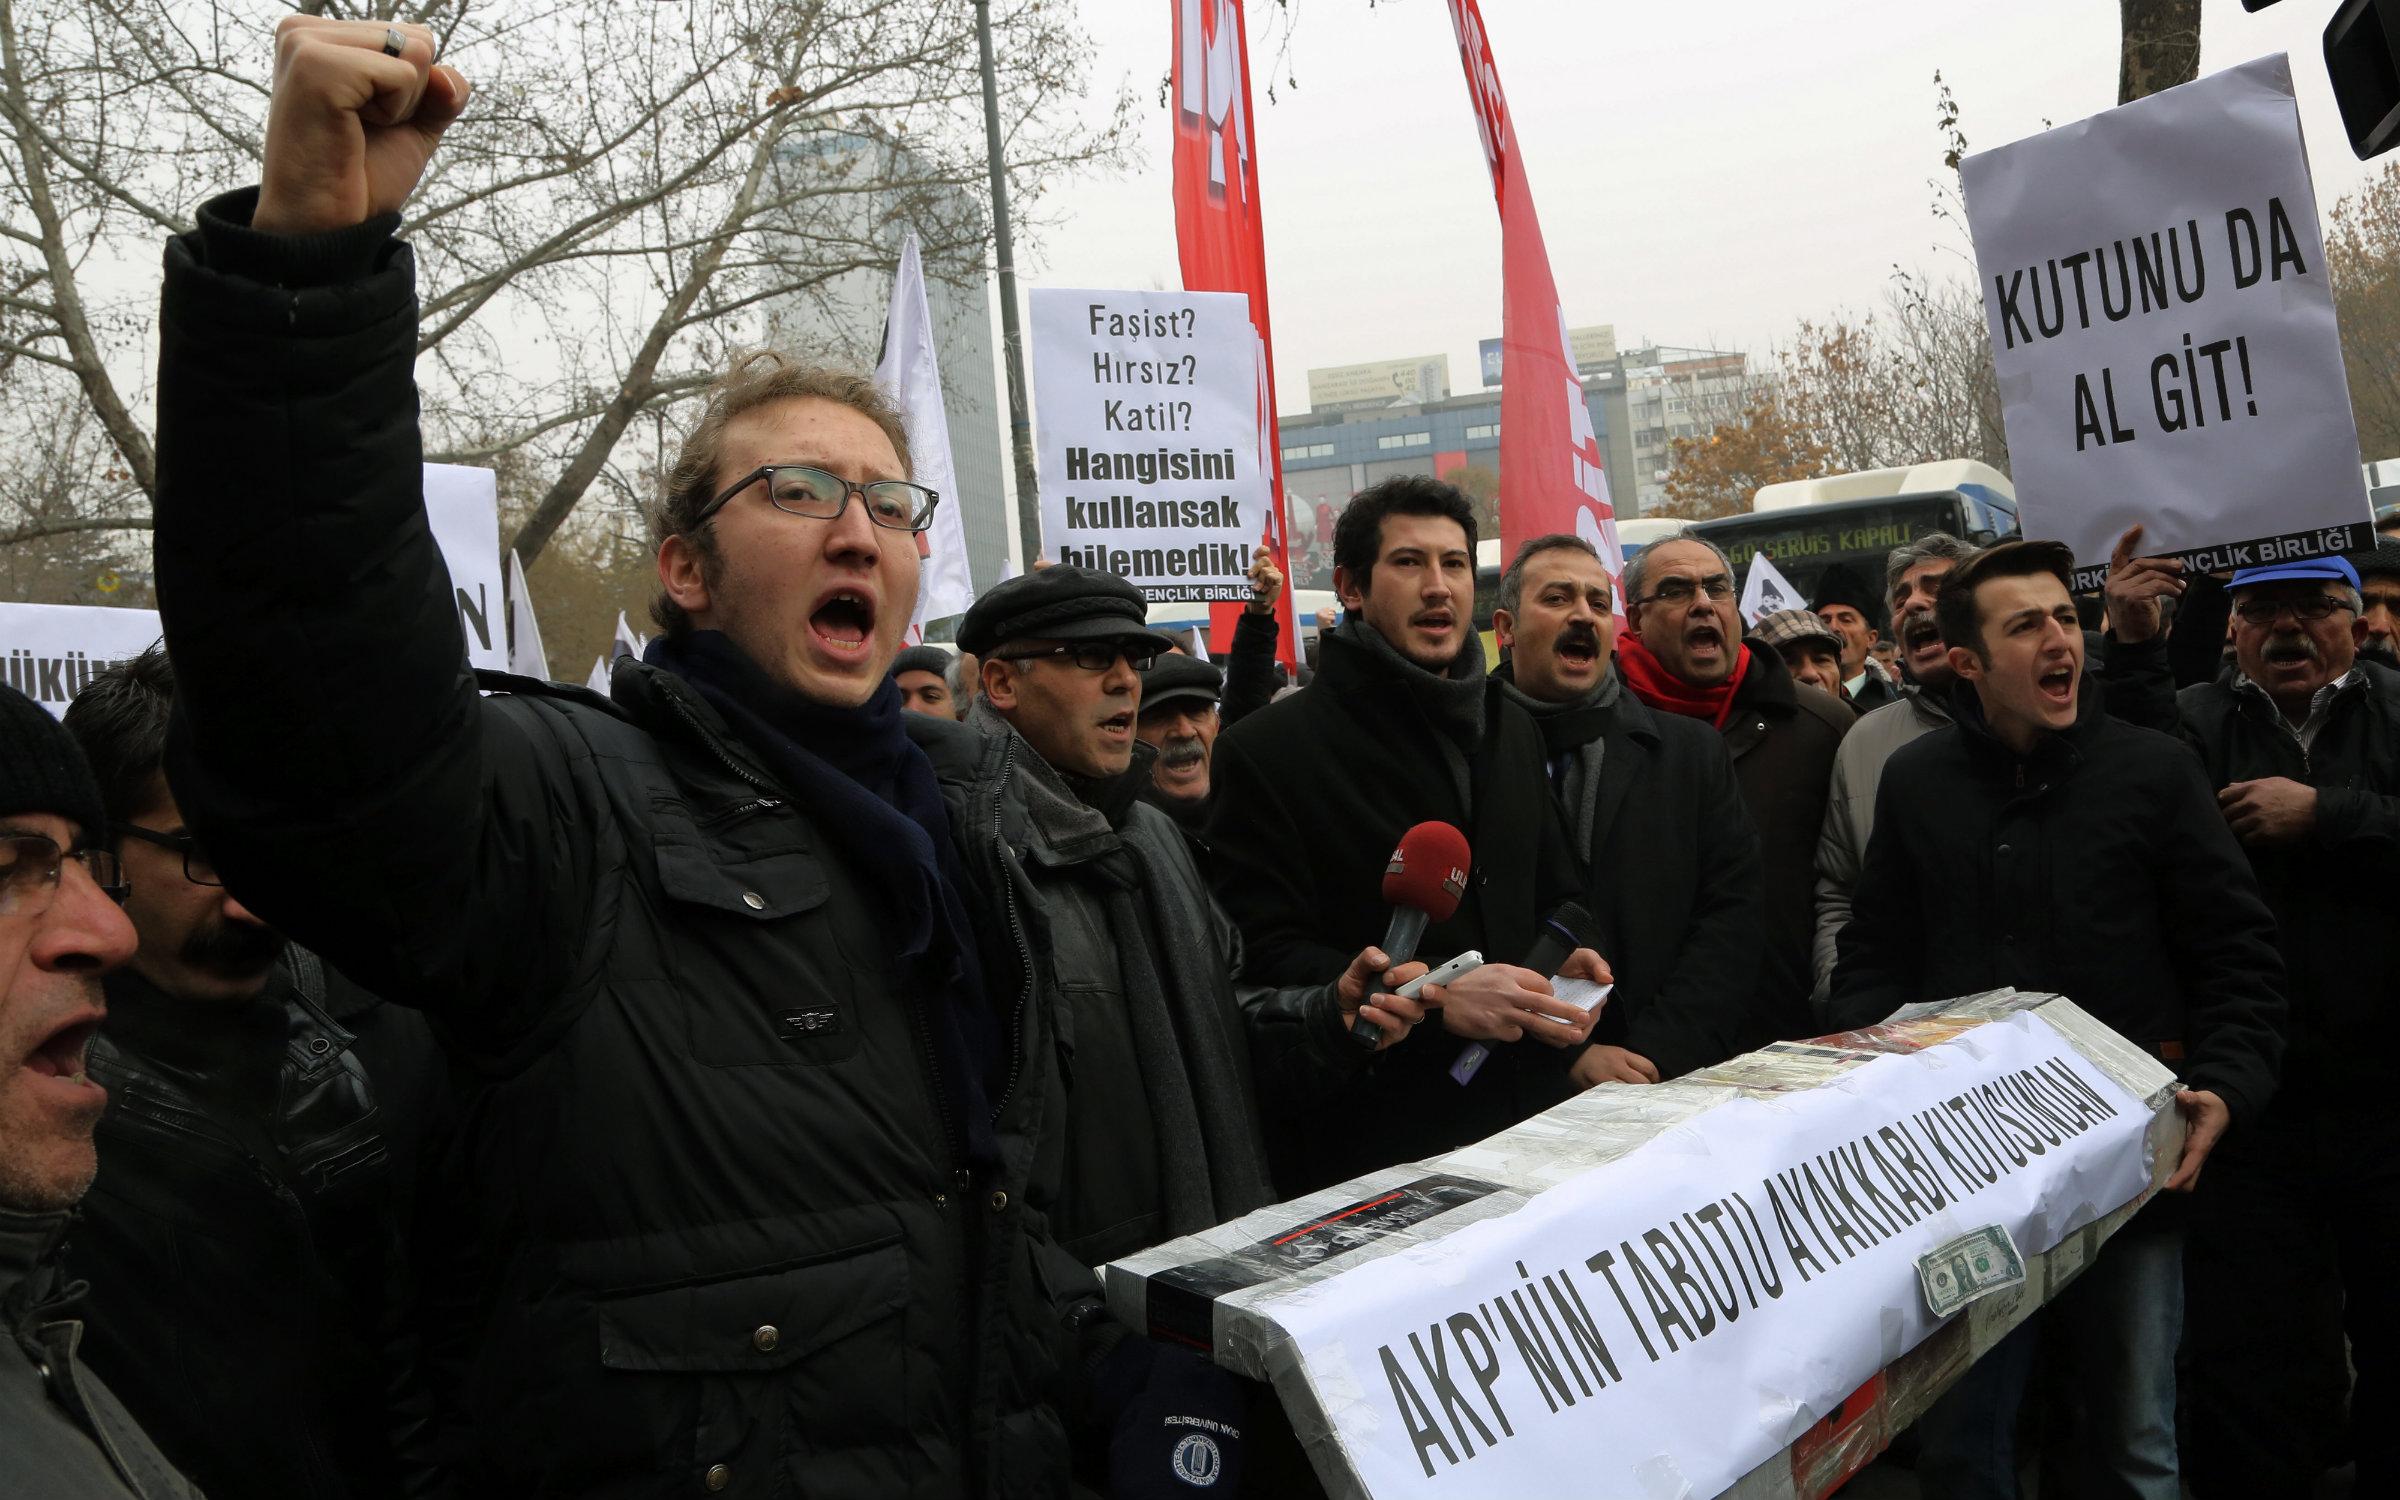 Protestors shout anti-government slogans in Ankara, Turkey on Dec. 21.